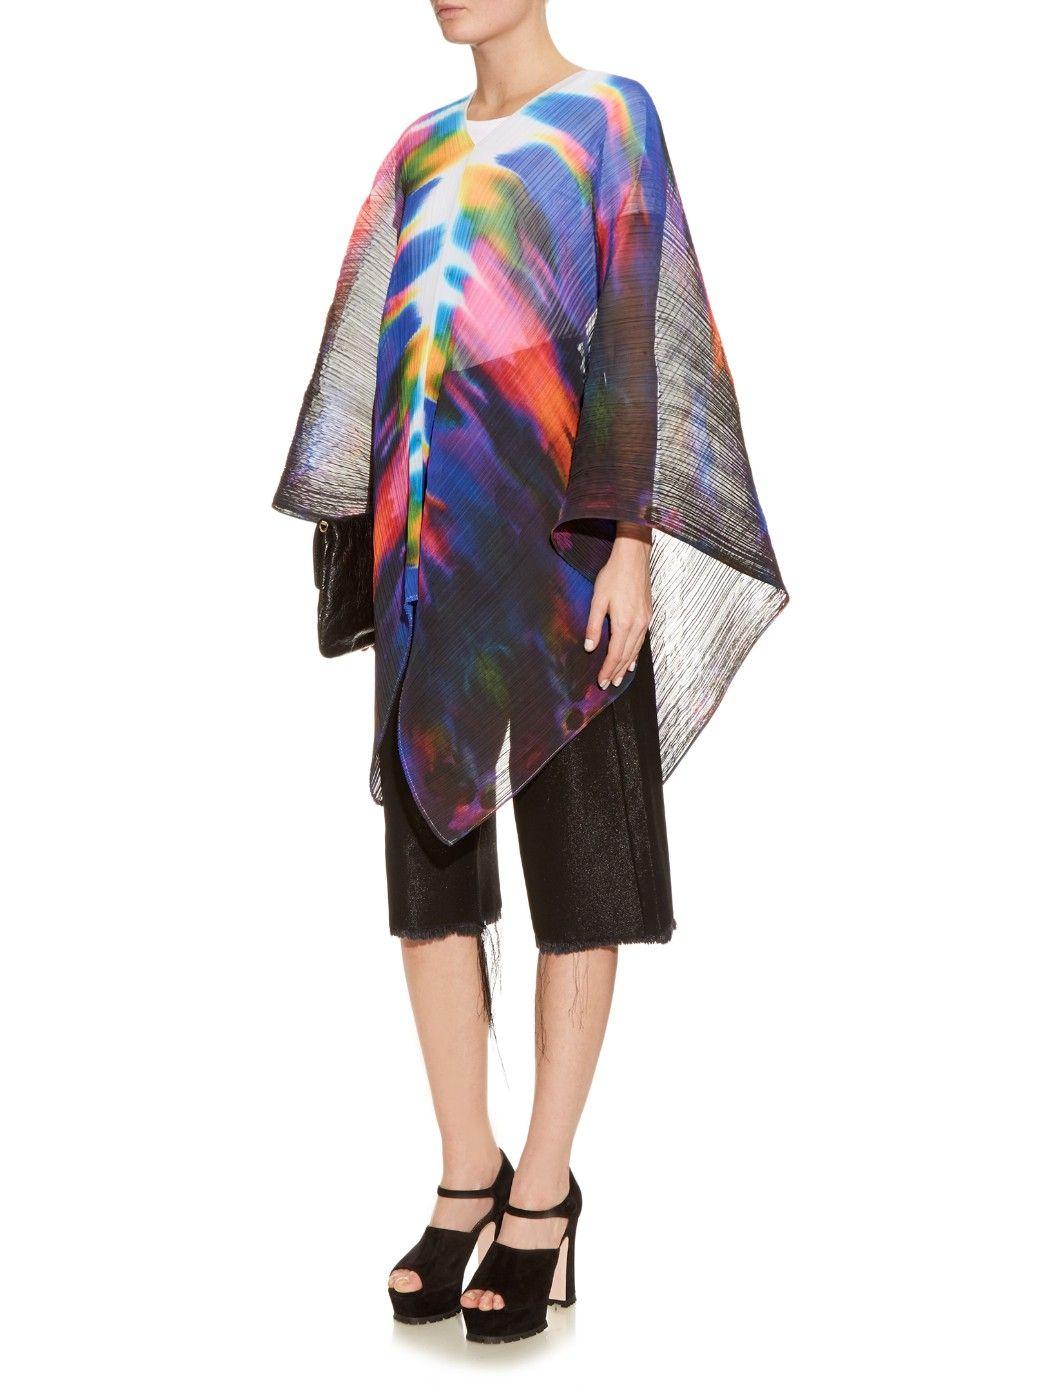 Tie-dye pleated scarf | Pleats Please Issey Miyake | MATCHESFASHION.COM